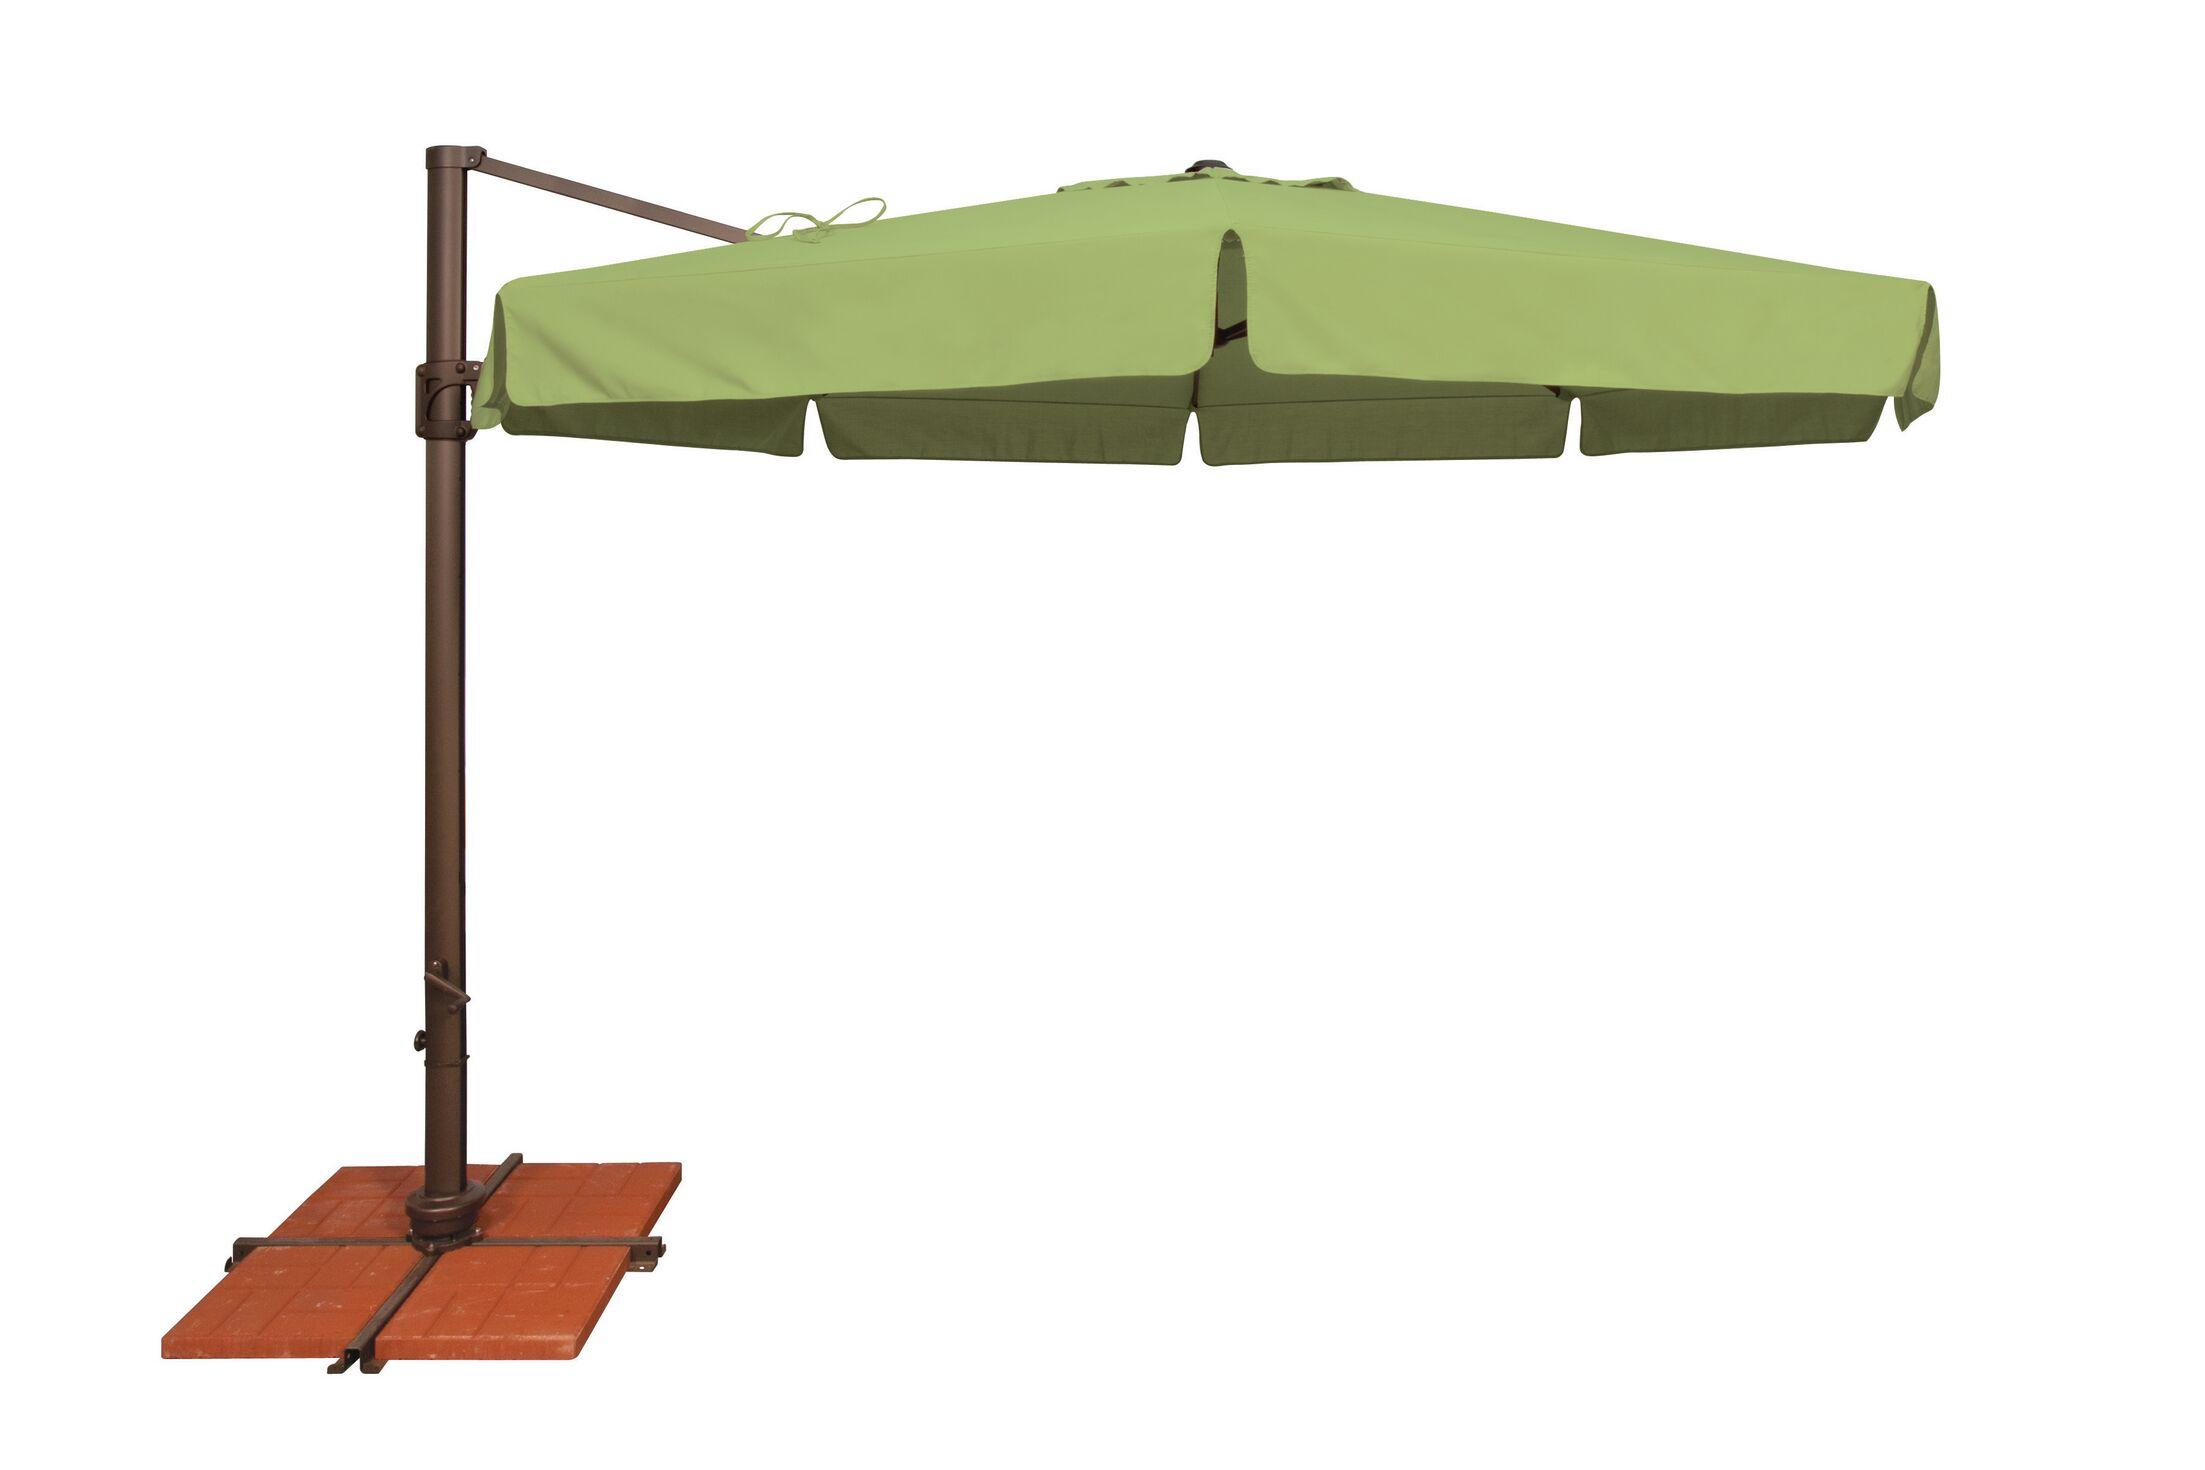 Bali 11' Cantilever Umbrella Fabric: Sunbrella / Ginkgo